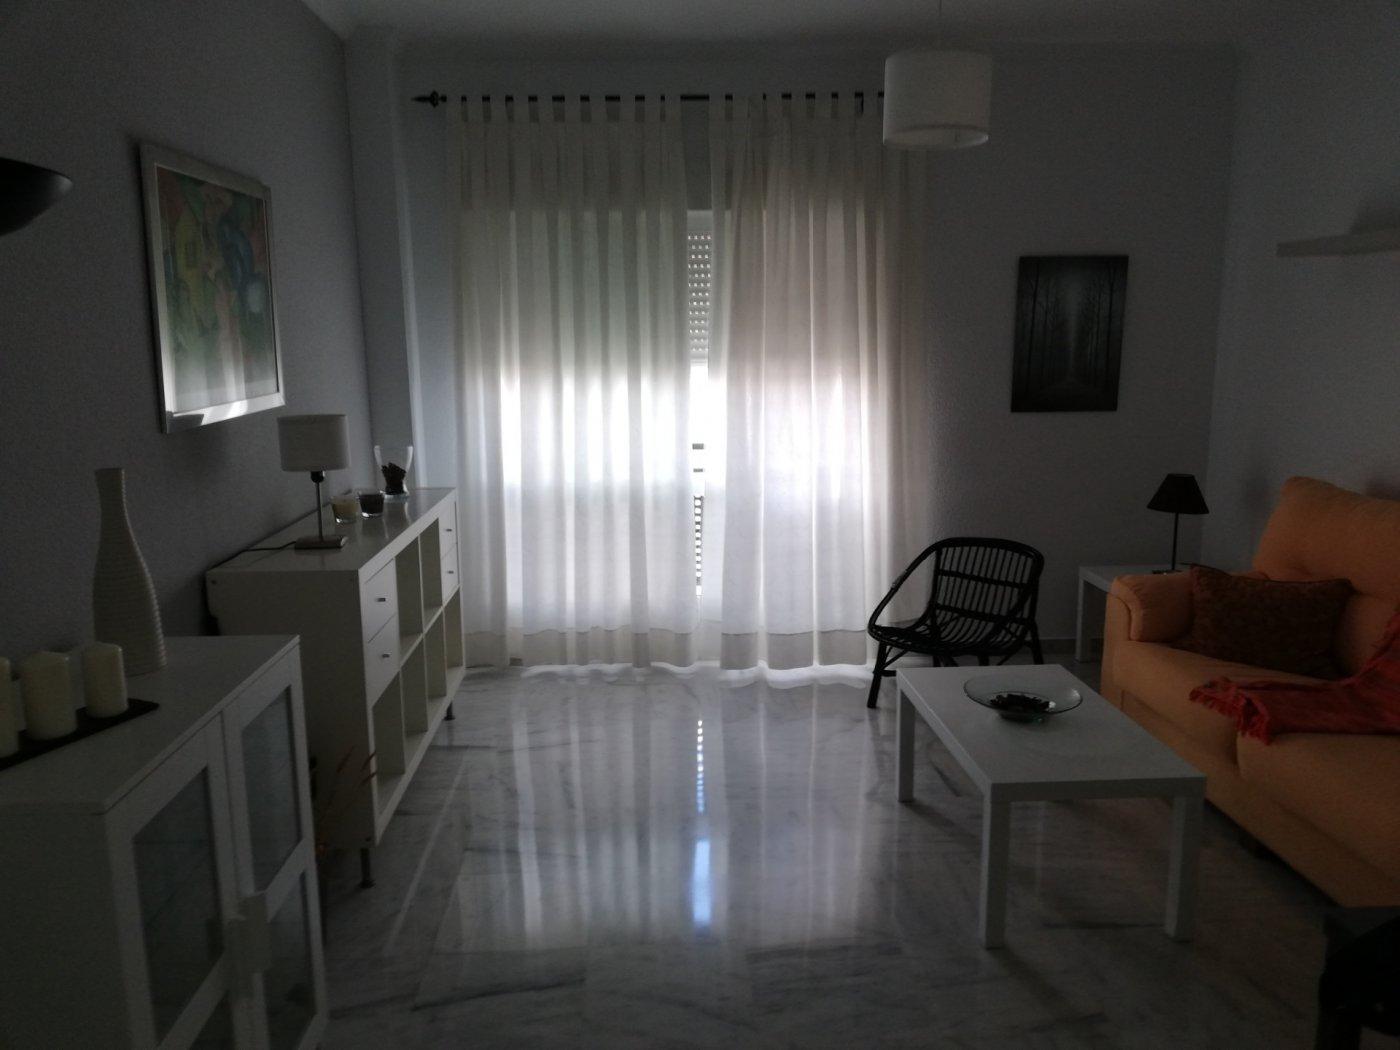 Flat for rent in Arroyo - Santa Justa, Sevilla